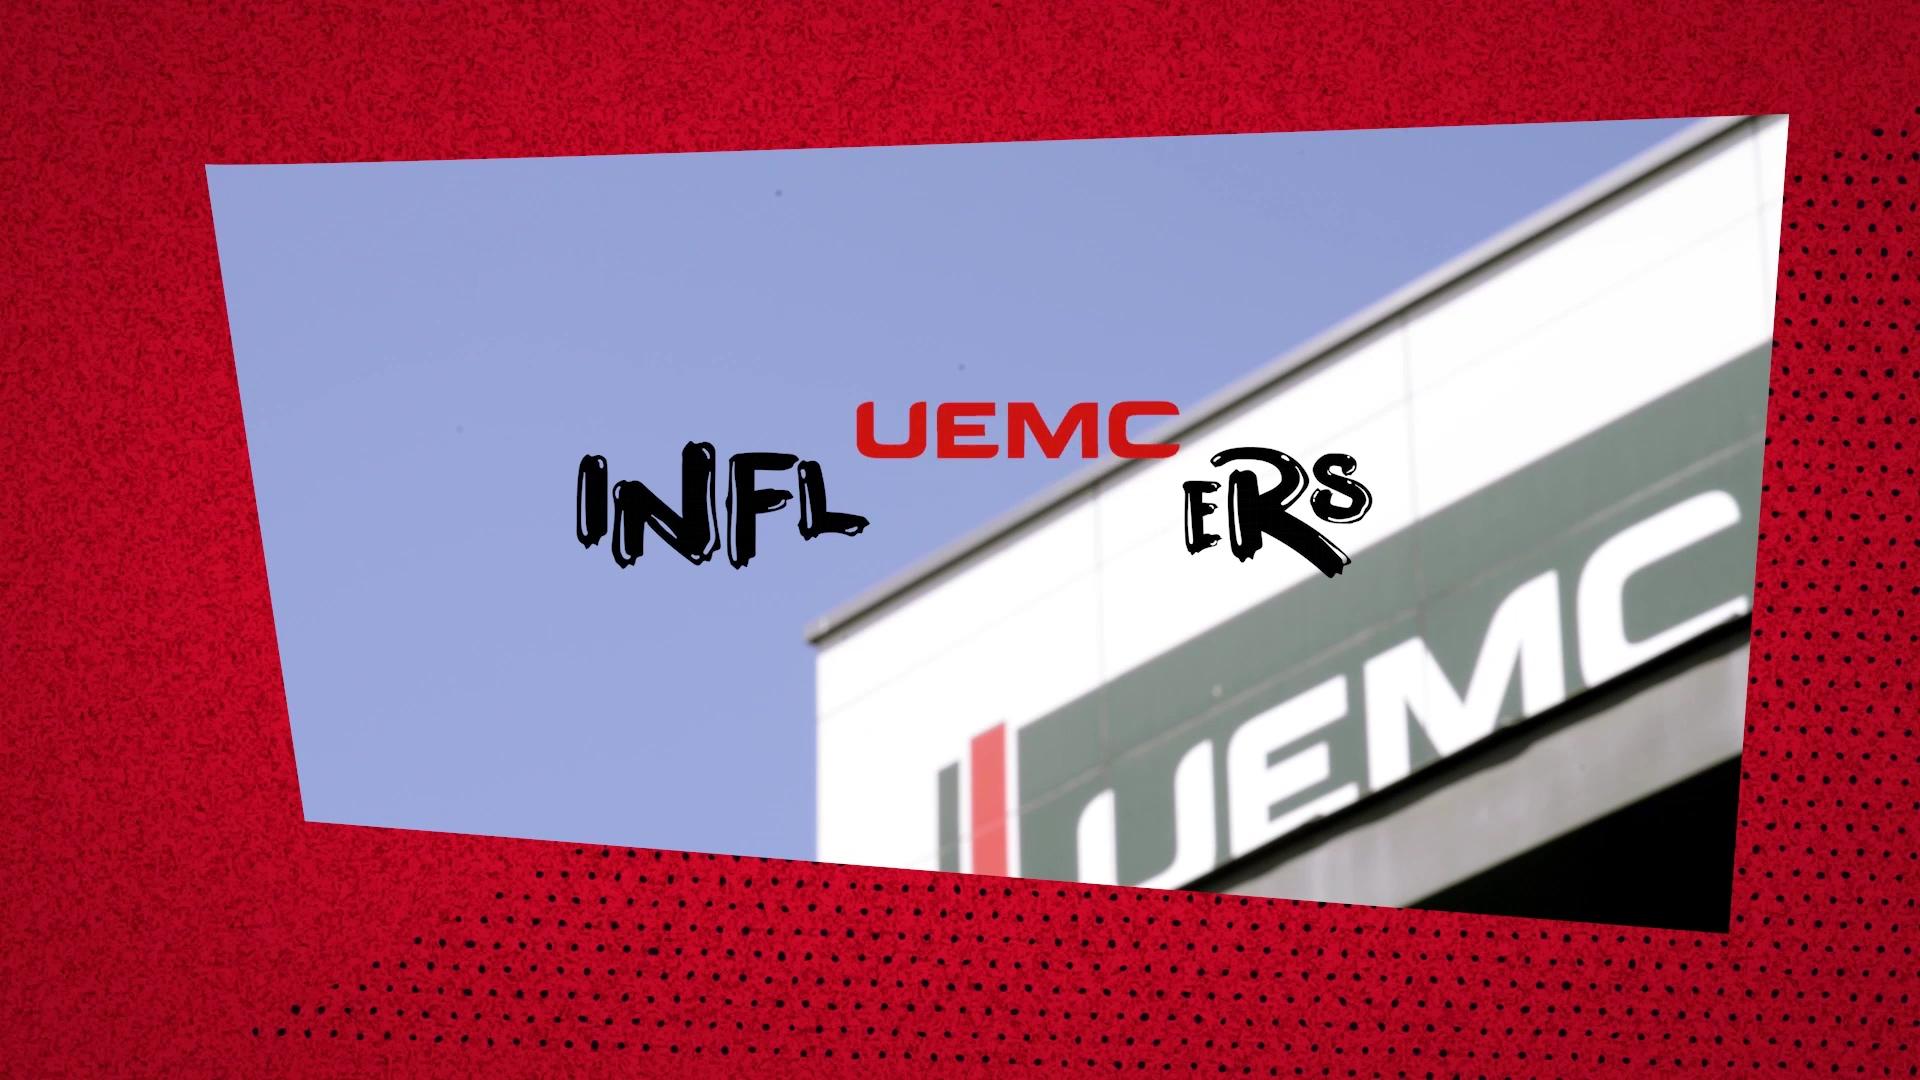 uemc-trailer-InflUEMCers